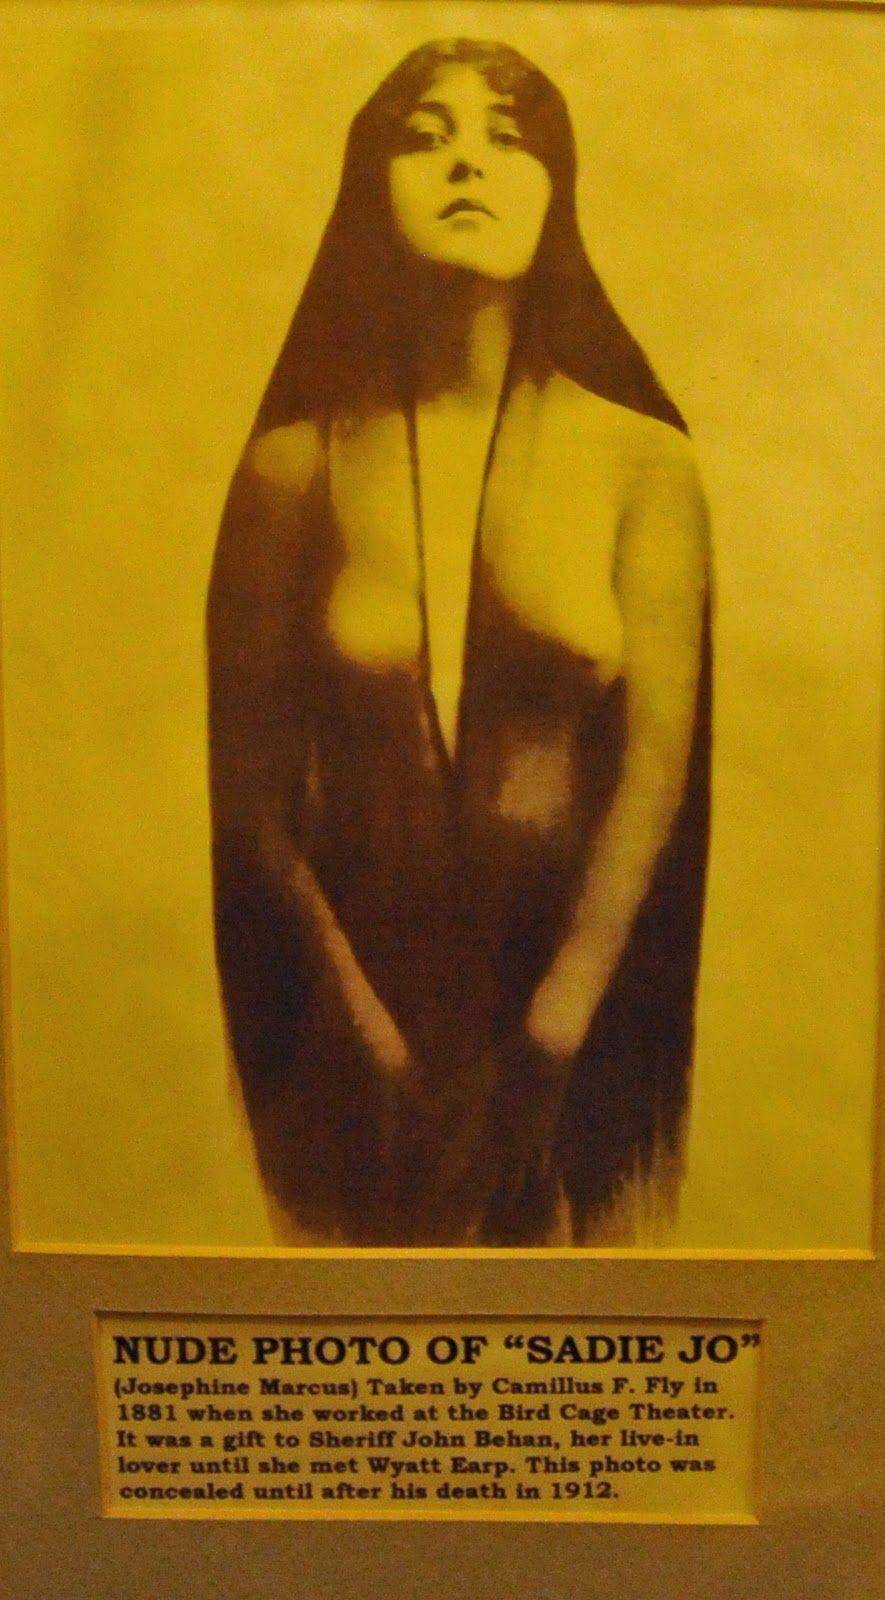 Amy Hill born May 9, 1953 (age 65),Charlayne Woodard Adult photos Leah Lail,Caroline Winberg SWE 7 2005?011